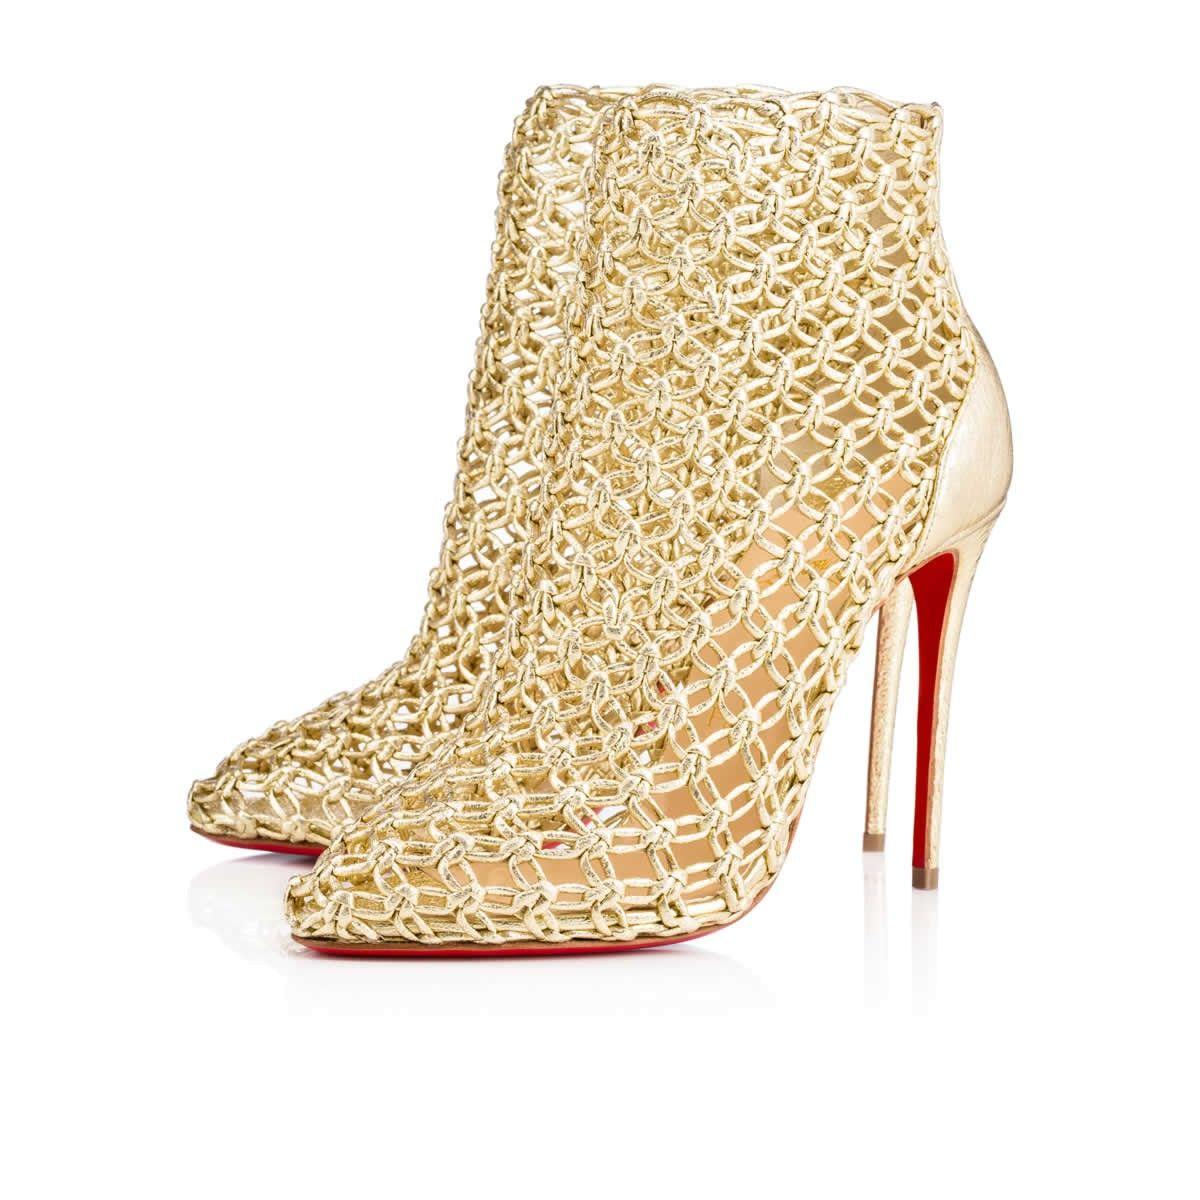 9eb2866e5df CHRISTIAN LOUBOUTIN Andaloulou 100Mm Gold Leather.  christianlouboutin   shoes